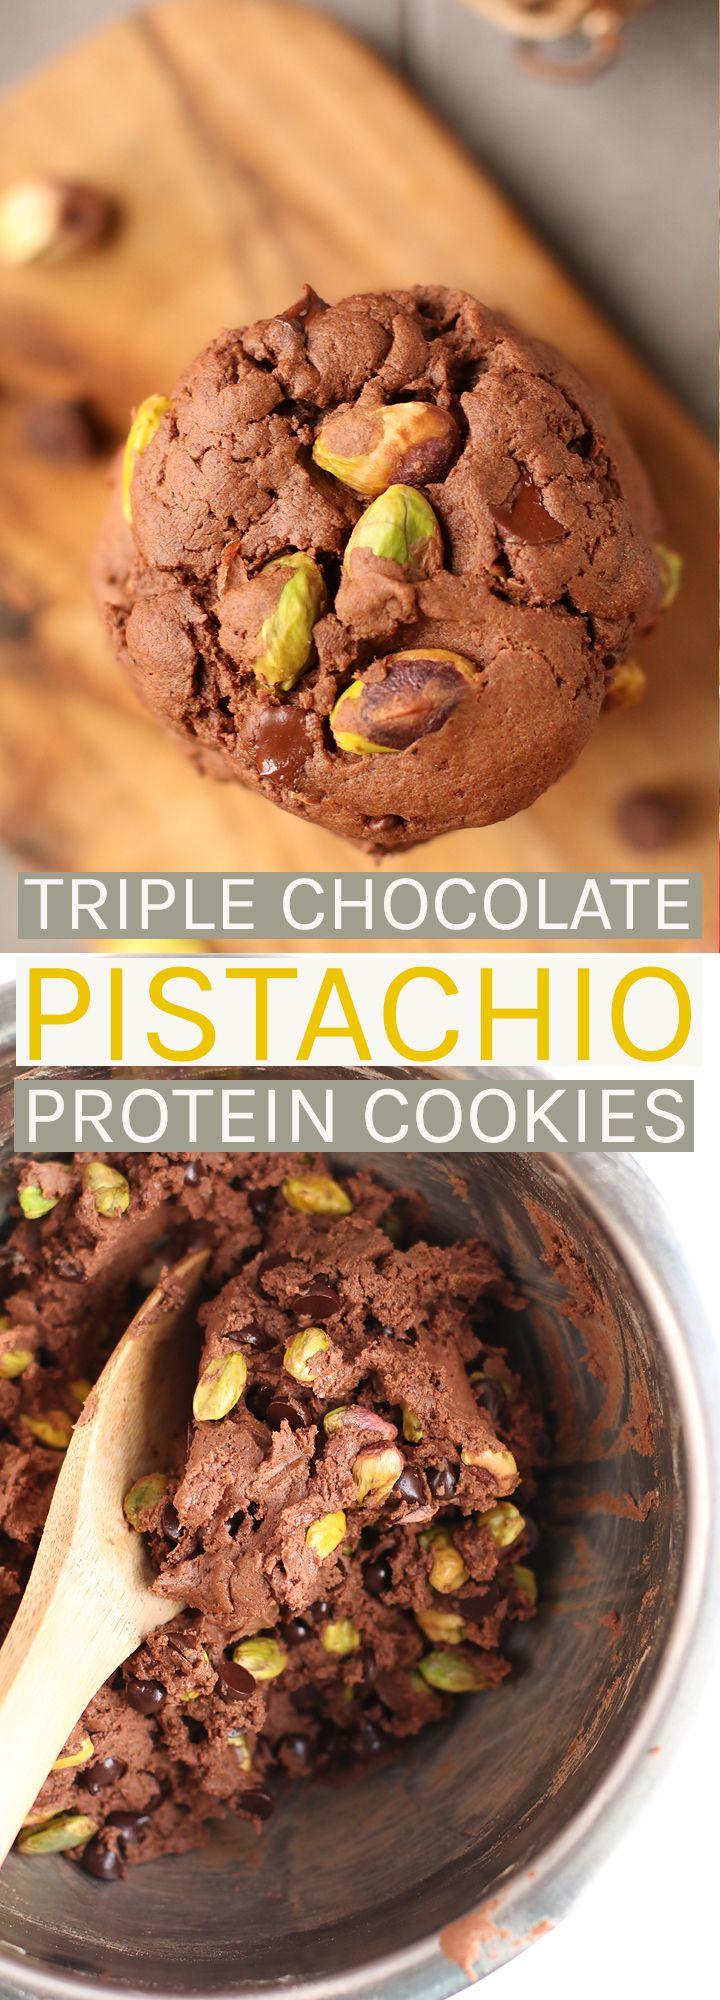 Vegan Triple Chocolate Pistachio Protein Cookies.